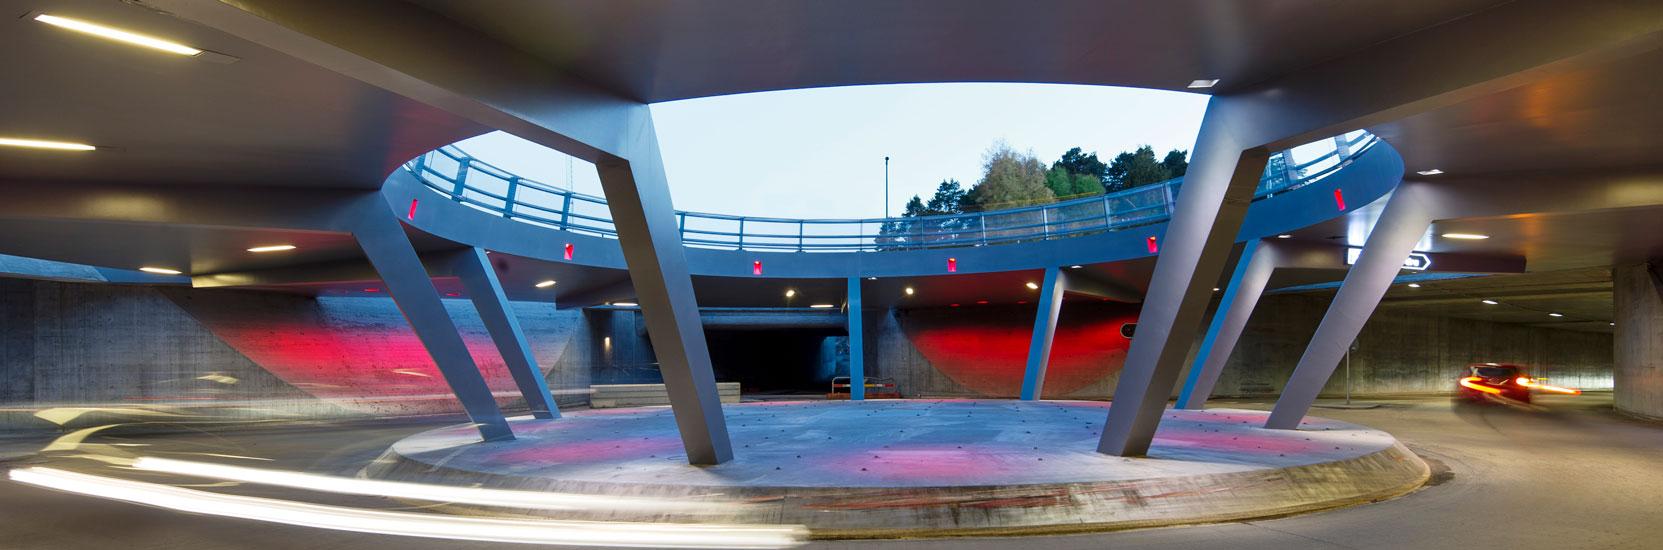 Täby C Roundabouts - Sweden